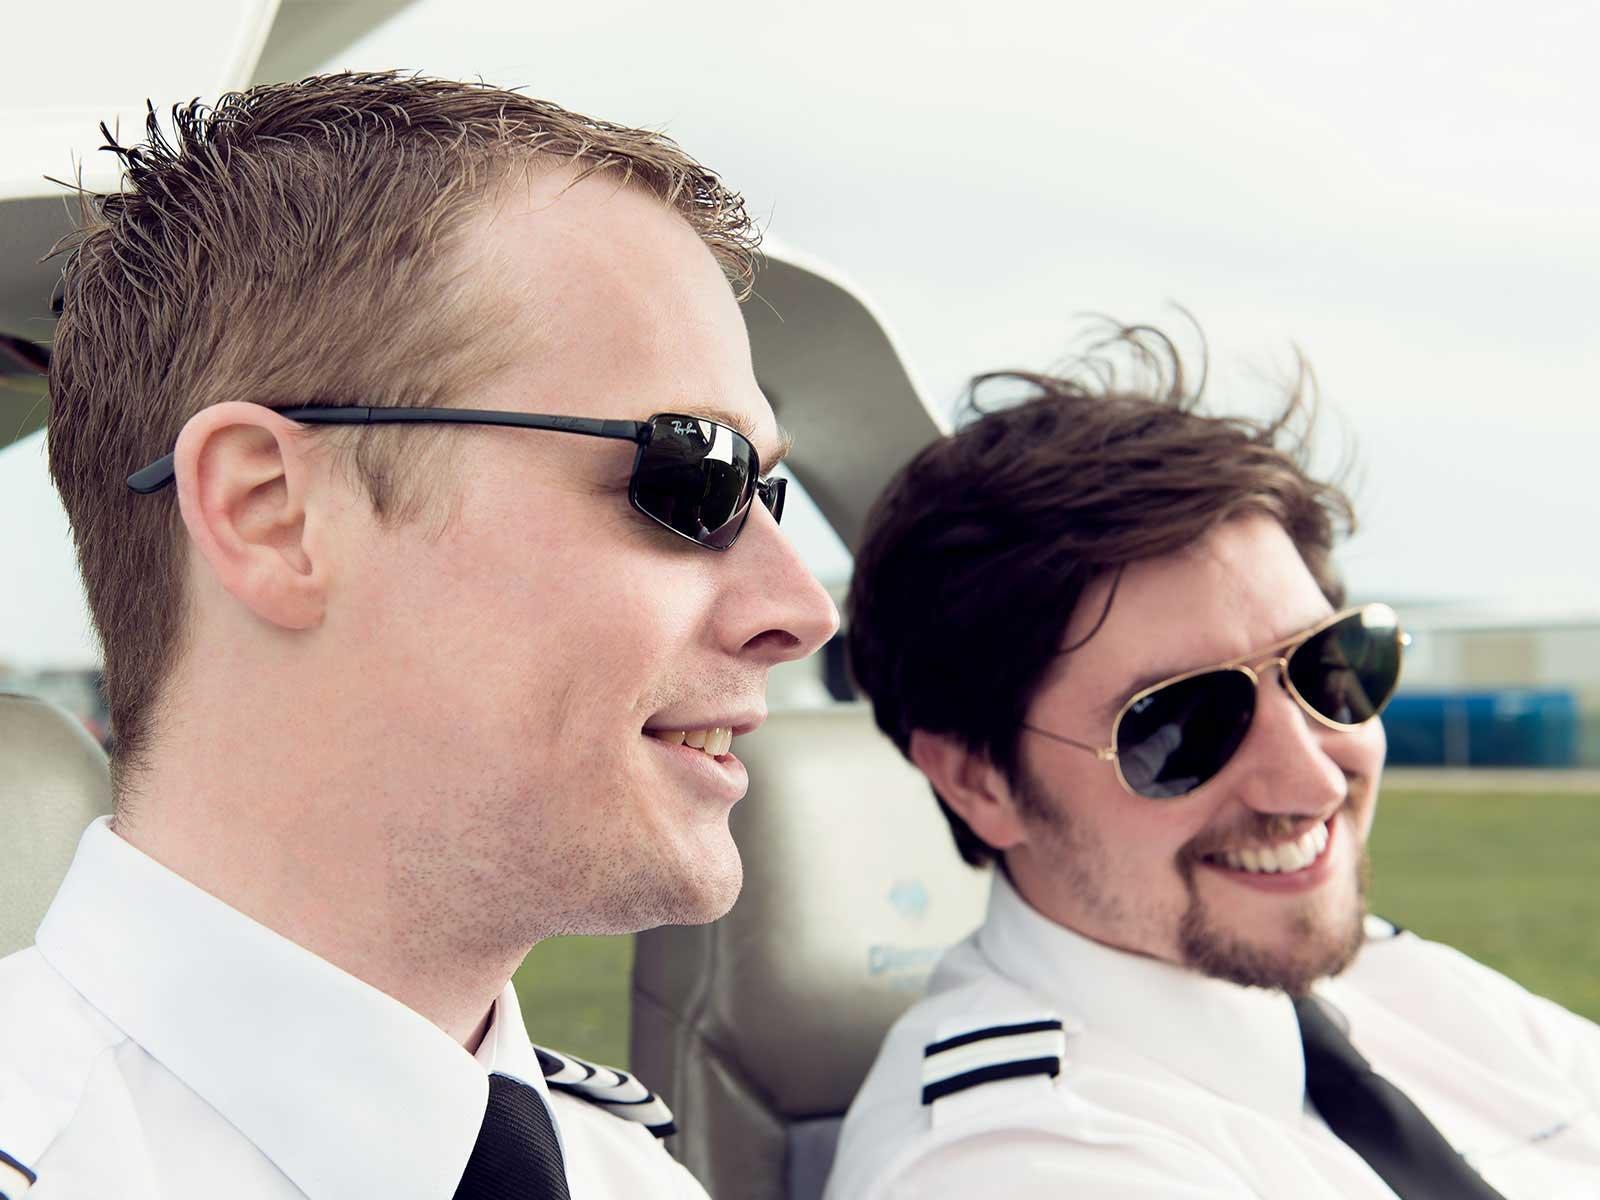 james-instructor-fta-pilot